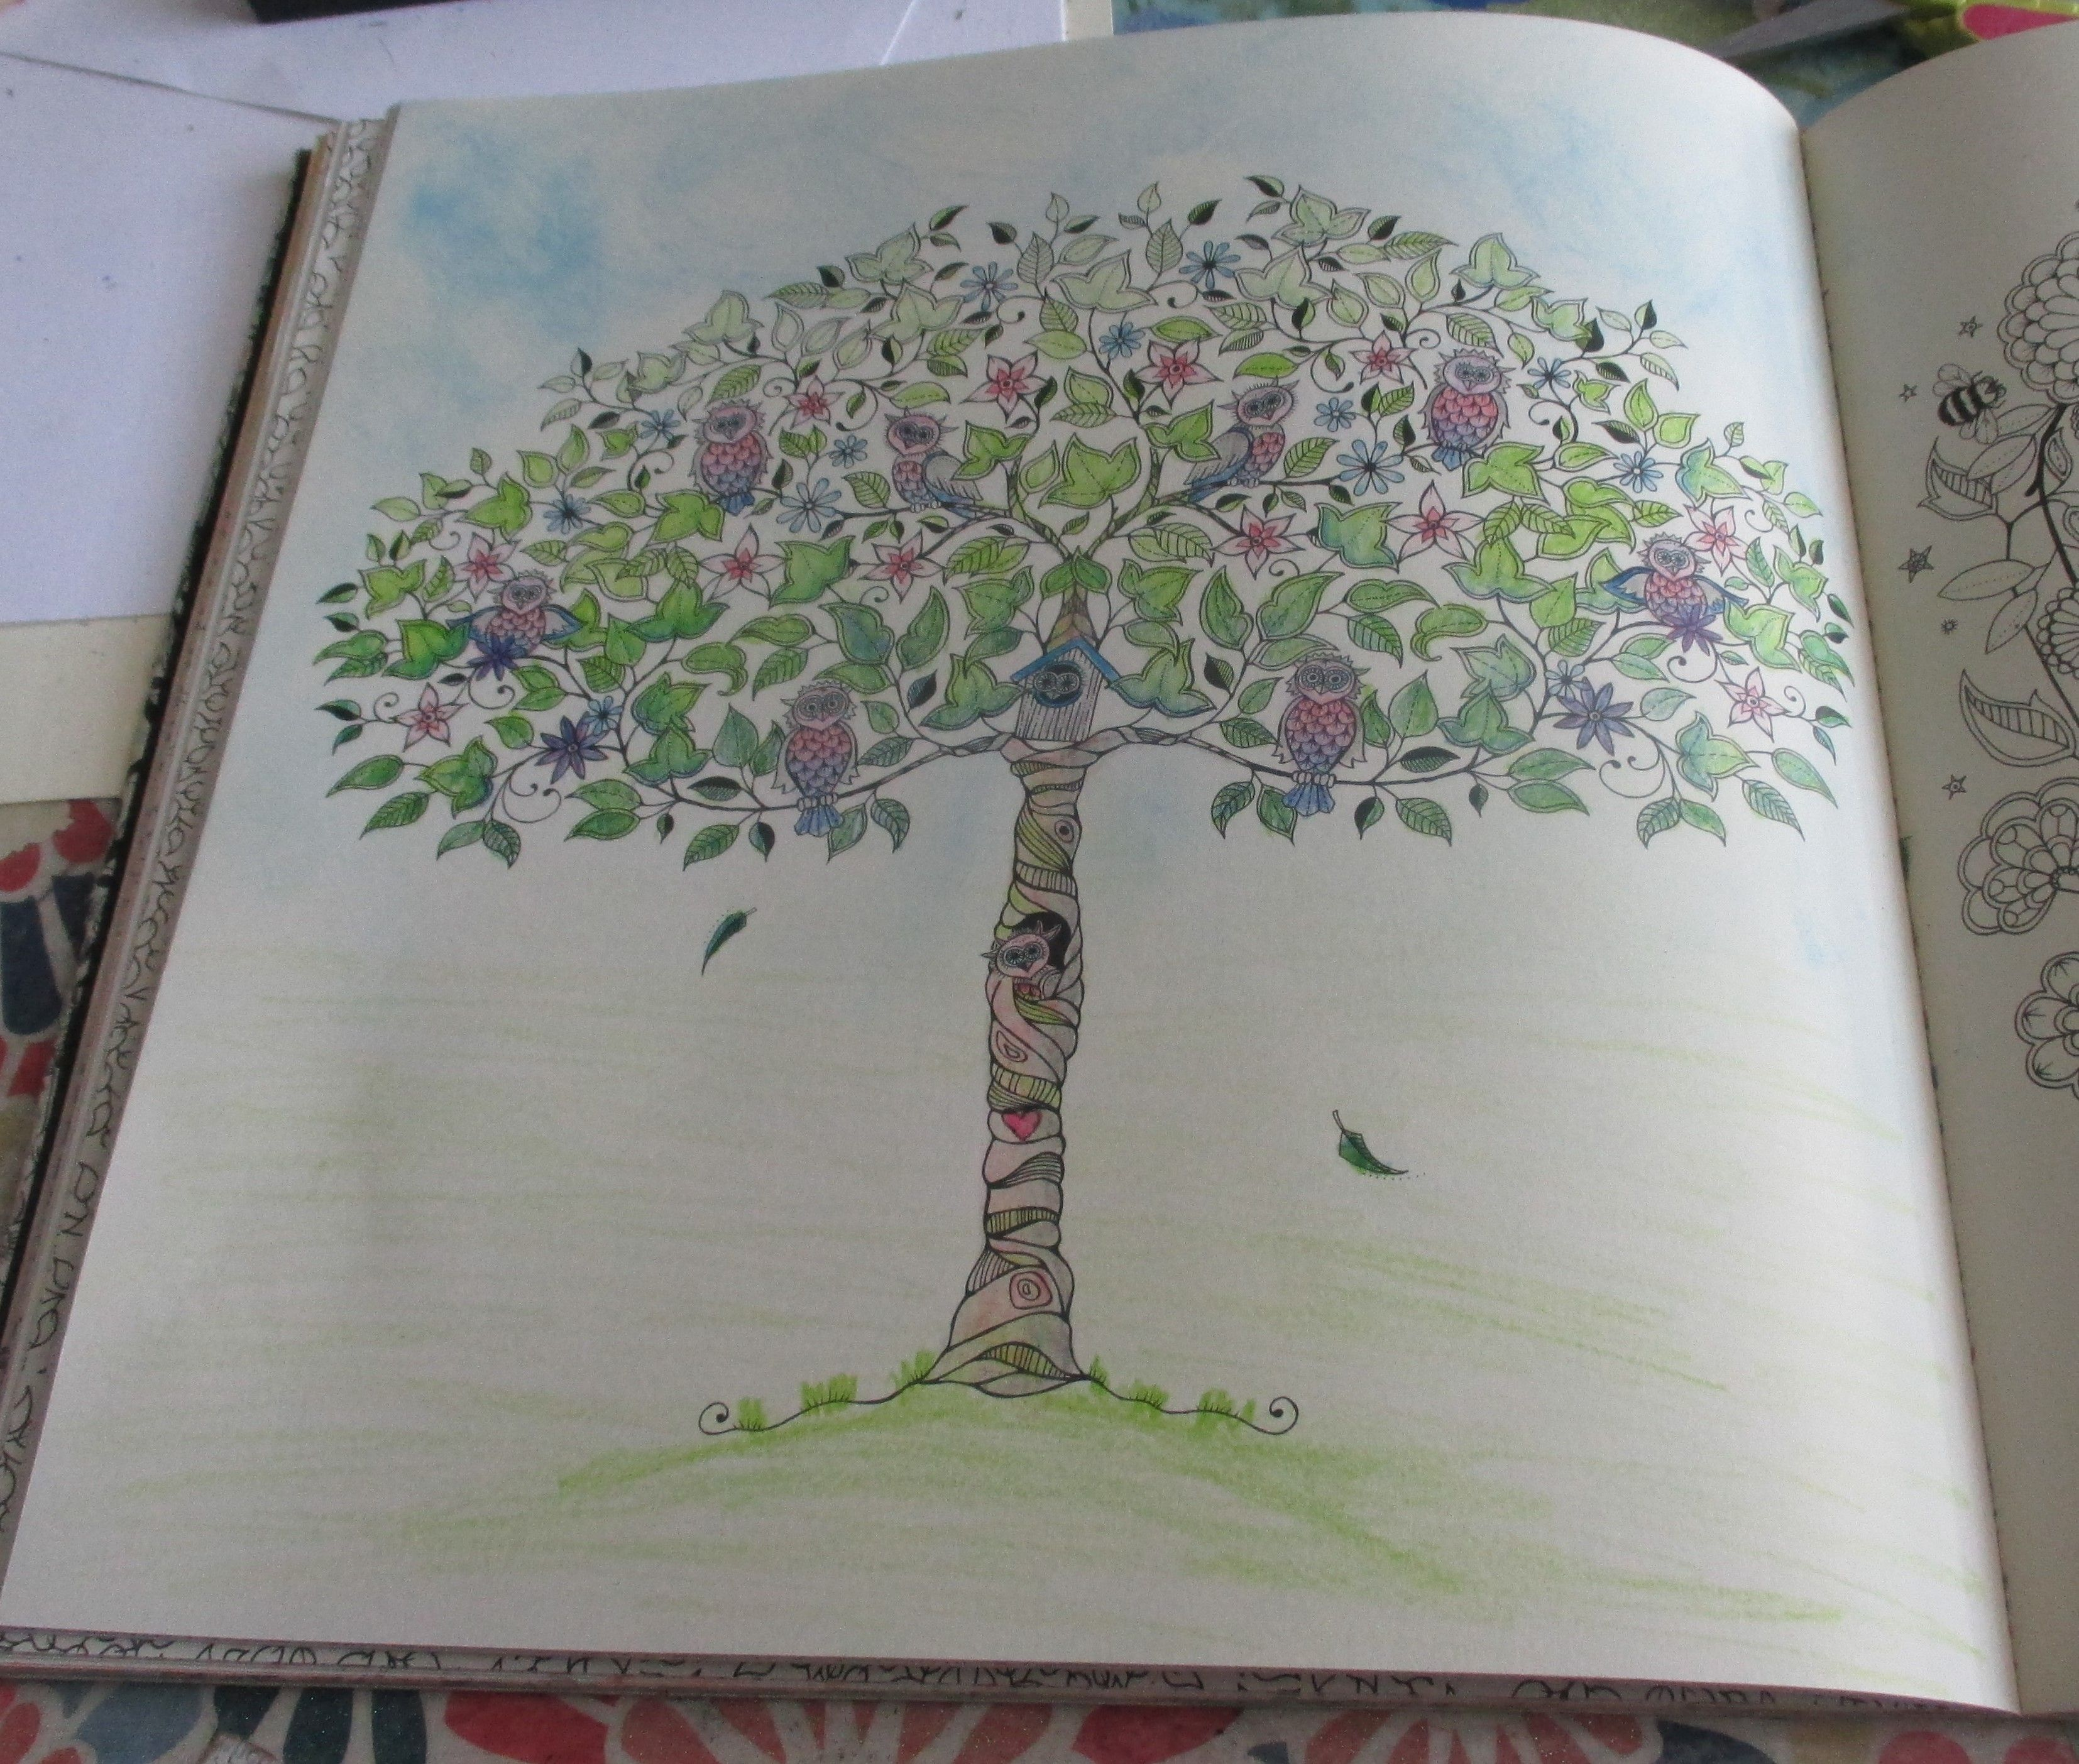 Secret Garden Tree With Owls Colored Koh I Noor Woodless Pencils